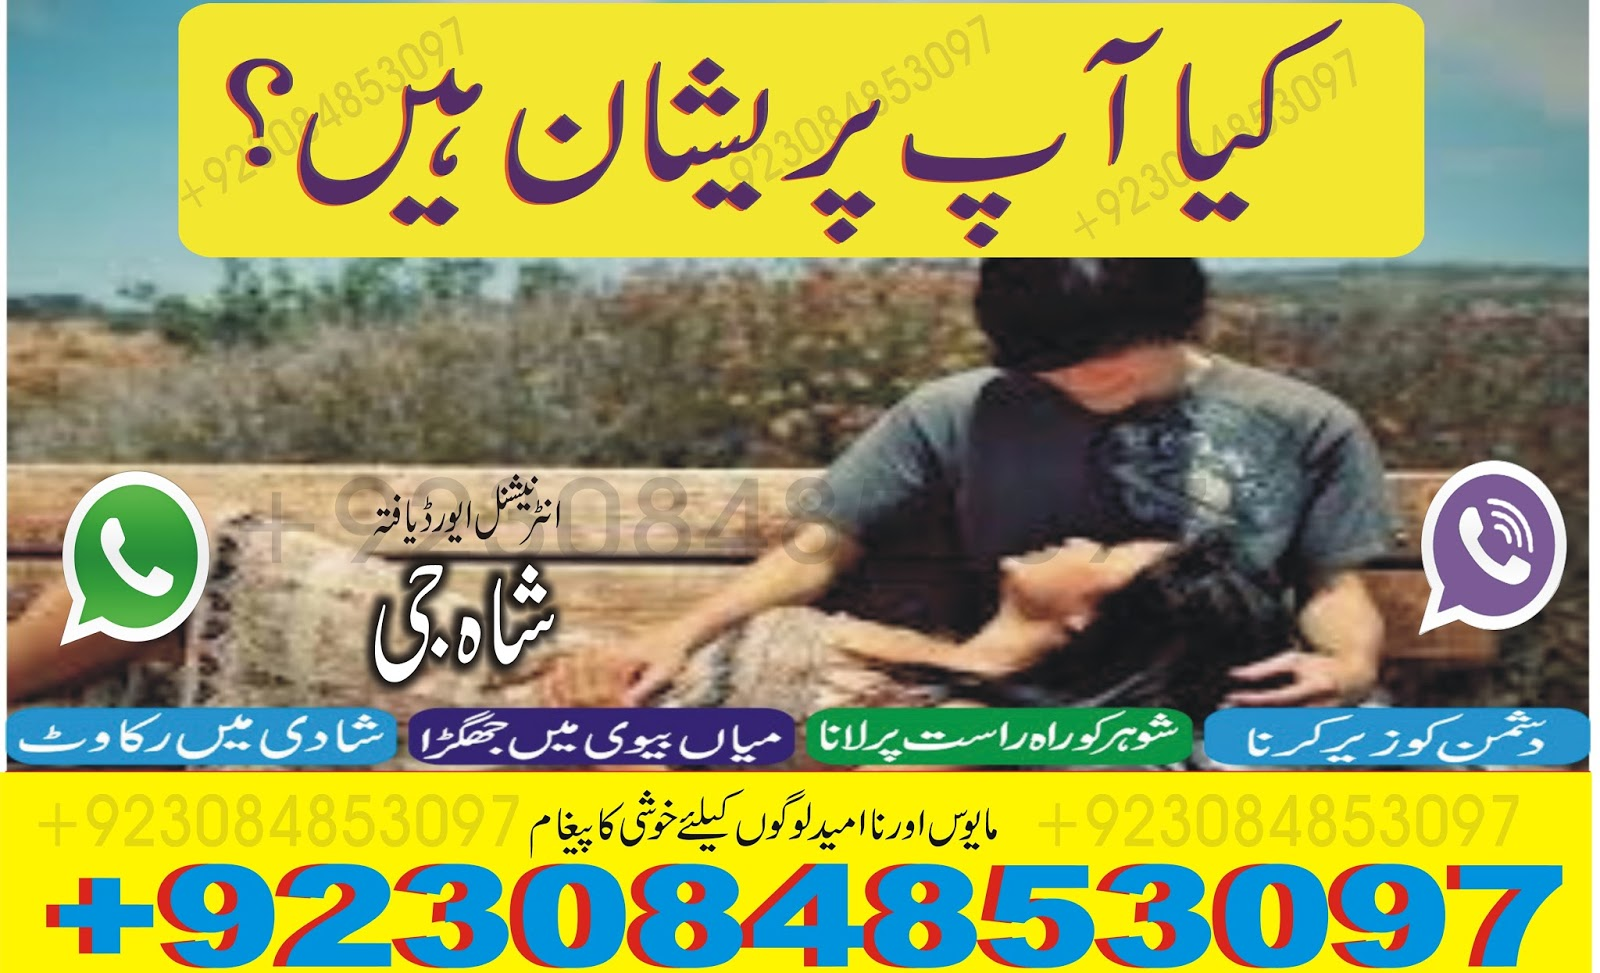 istikhara online free dawateislami istikhara contact number dawateislami istikhara whatsapp number online istikhara on phone istikhara online for